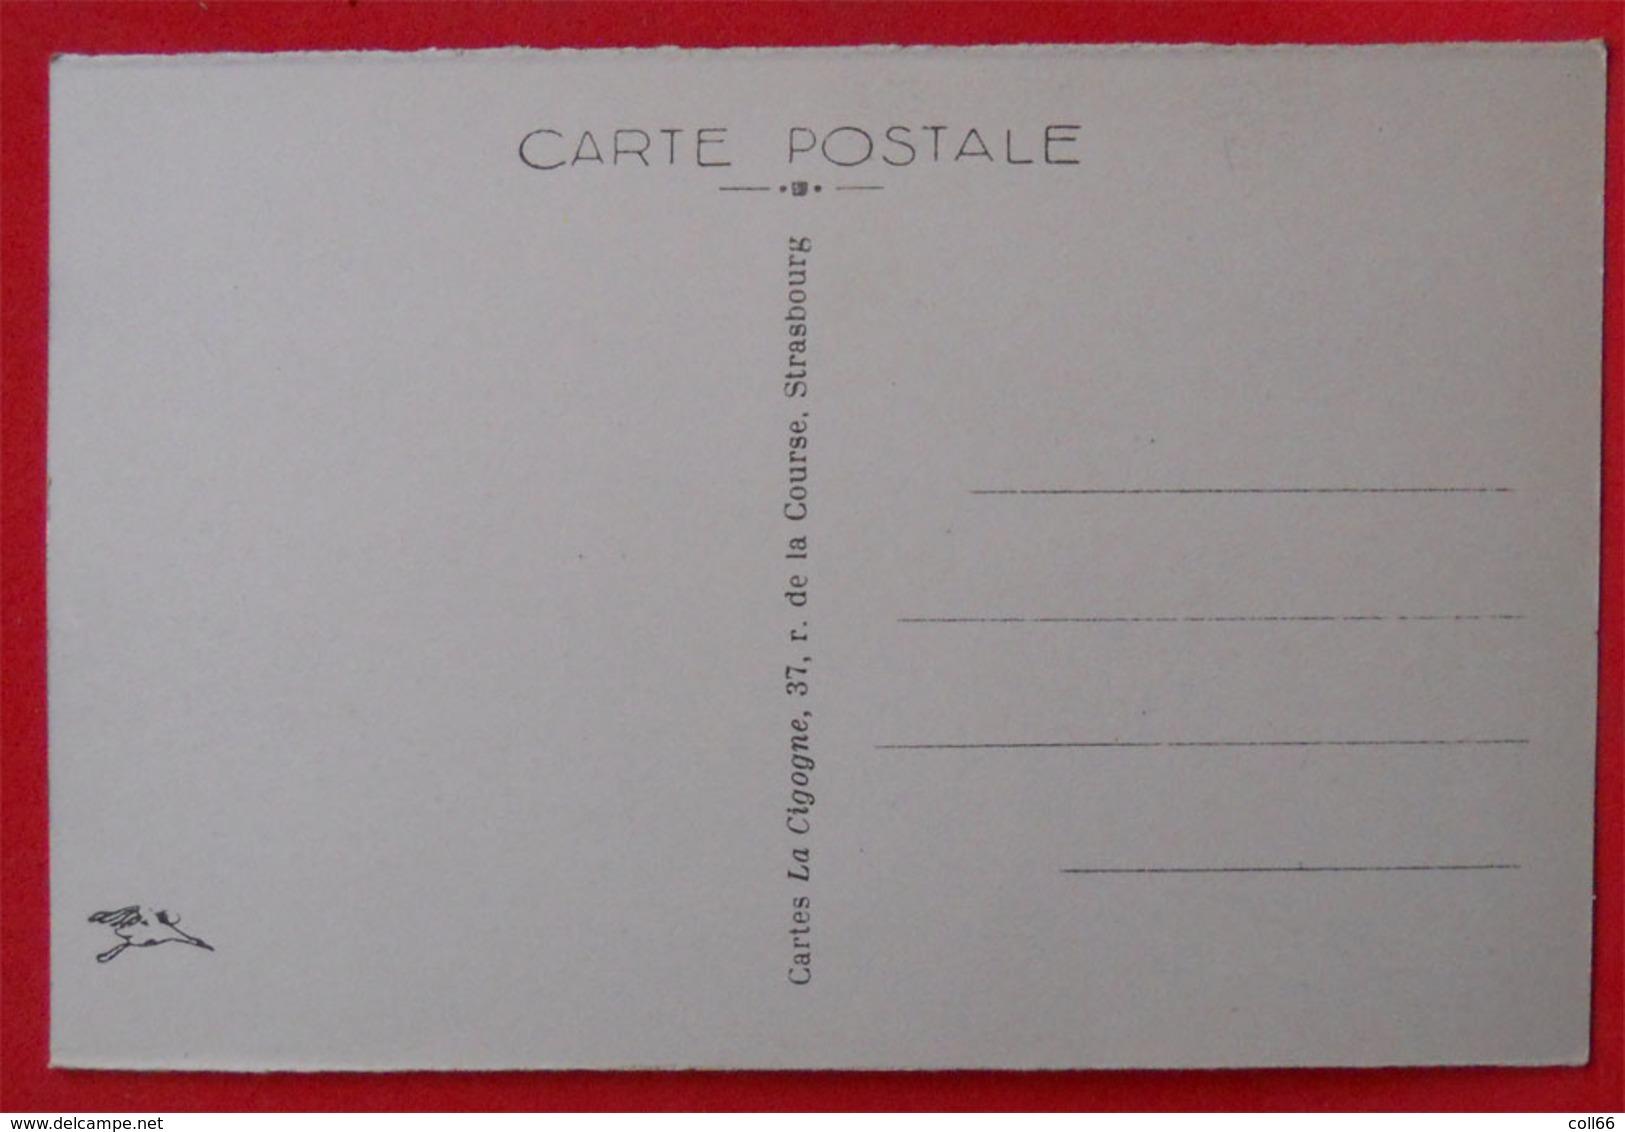 57 Sarrebourg Lot 1938 Lot De 16 Cpa Cartes Postales Différentes éditeur La Cigogne Strasbourg - Sarrebourg